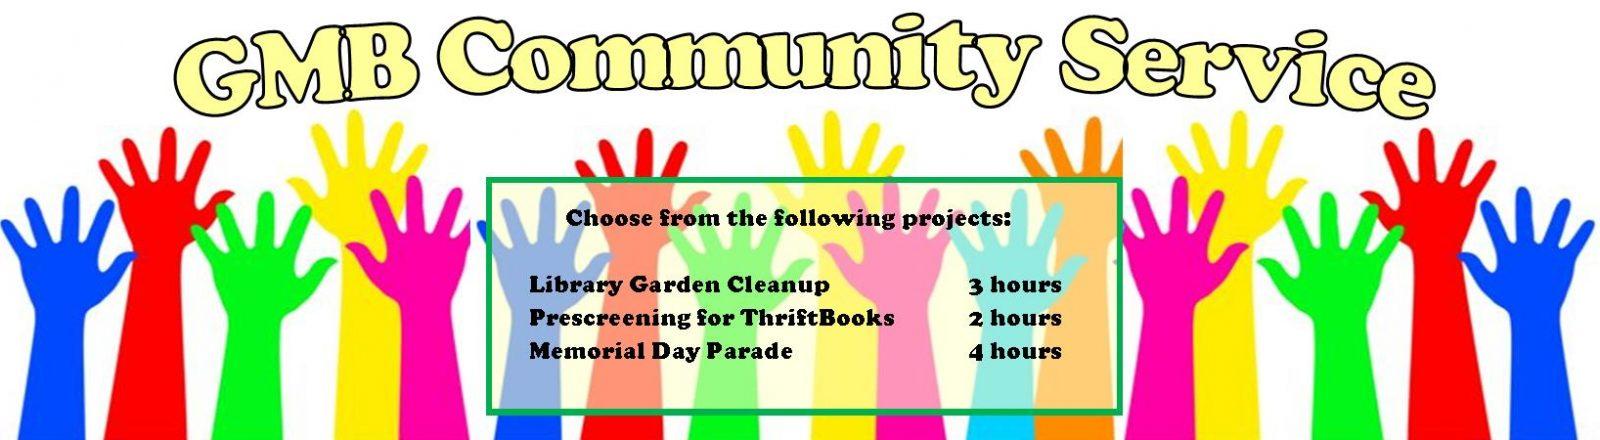 GMB Community Service